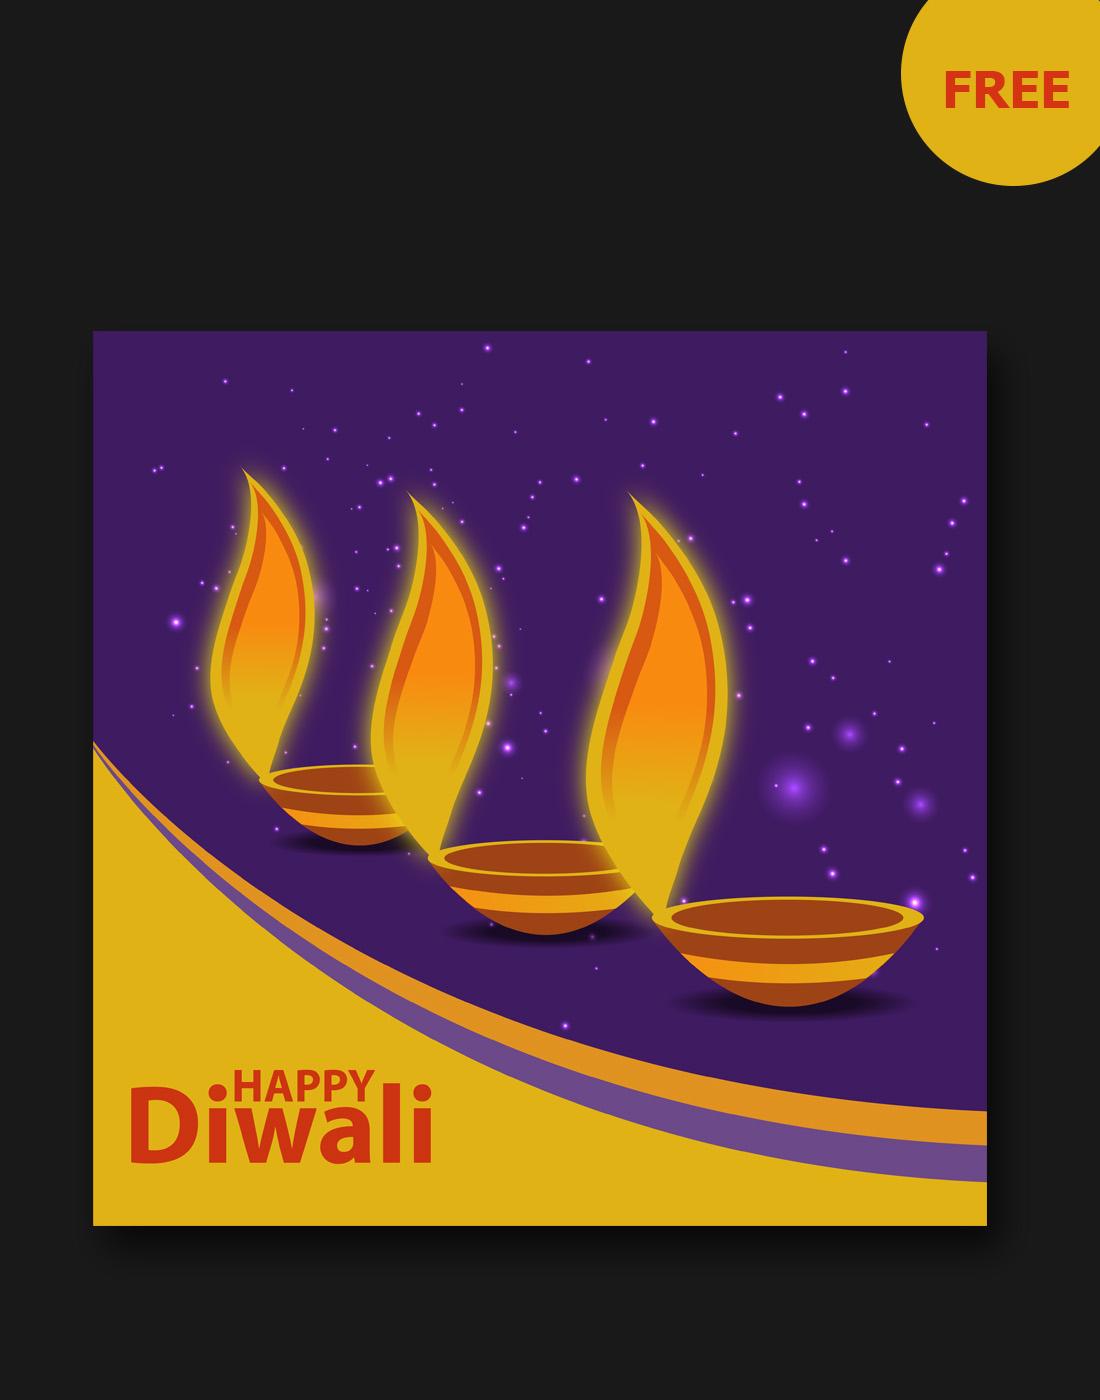 diwali vector graphic